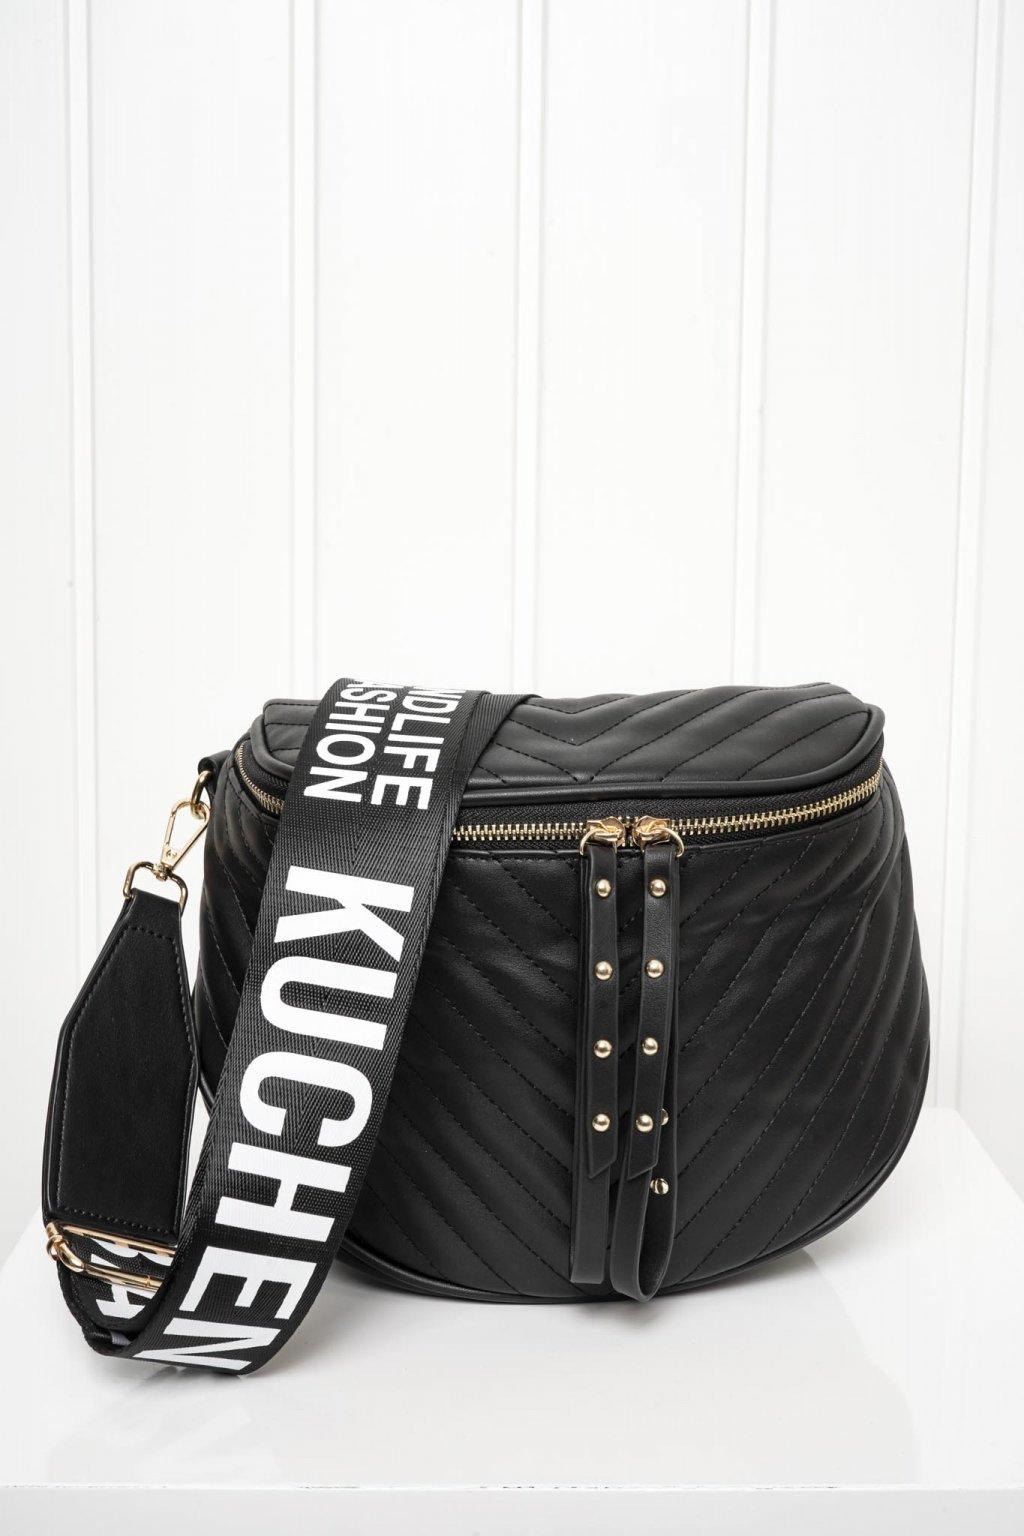 Kabelka, crossbody, ruksak, shopping bag, shopperka, 179